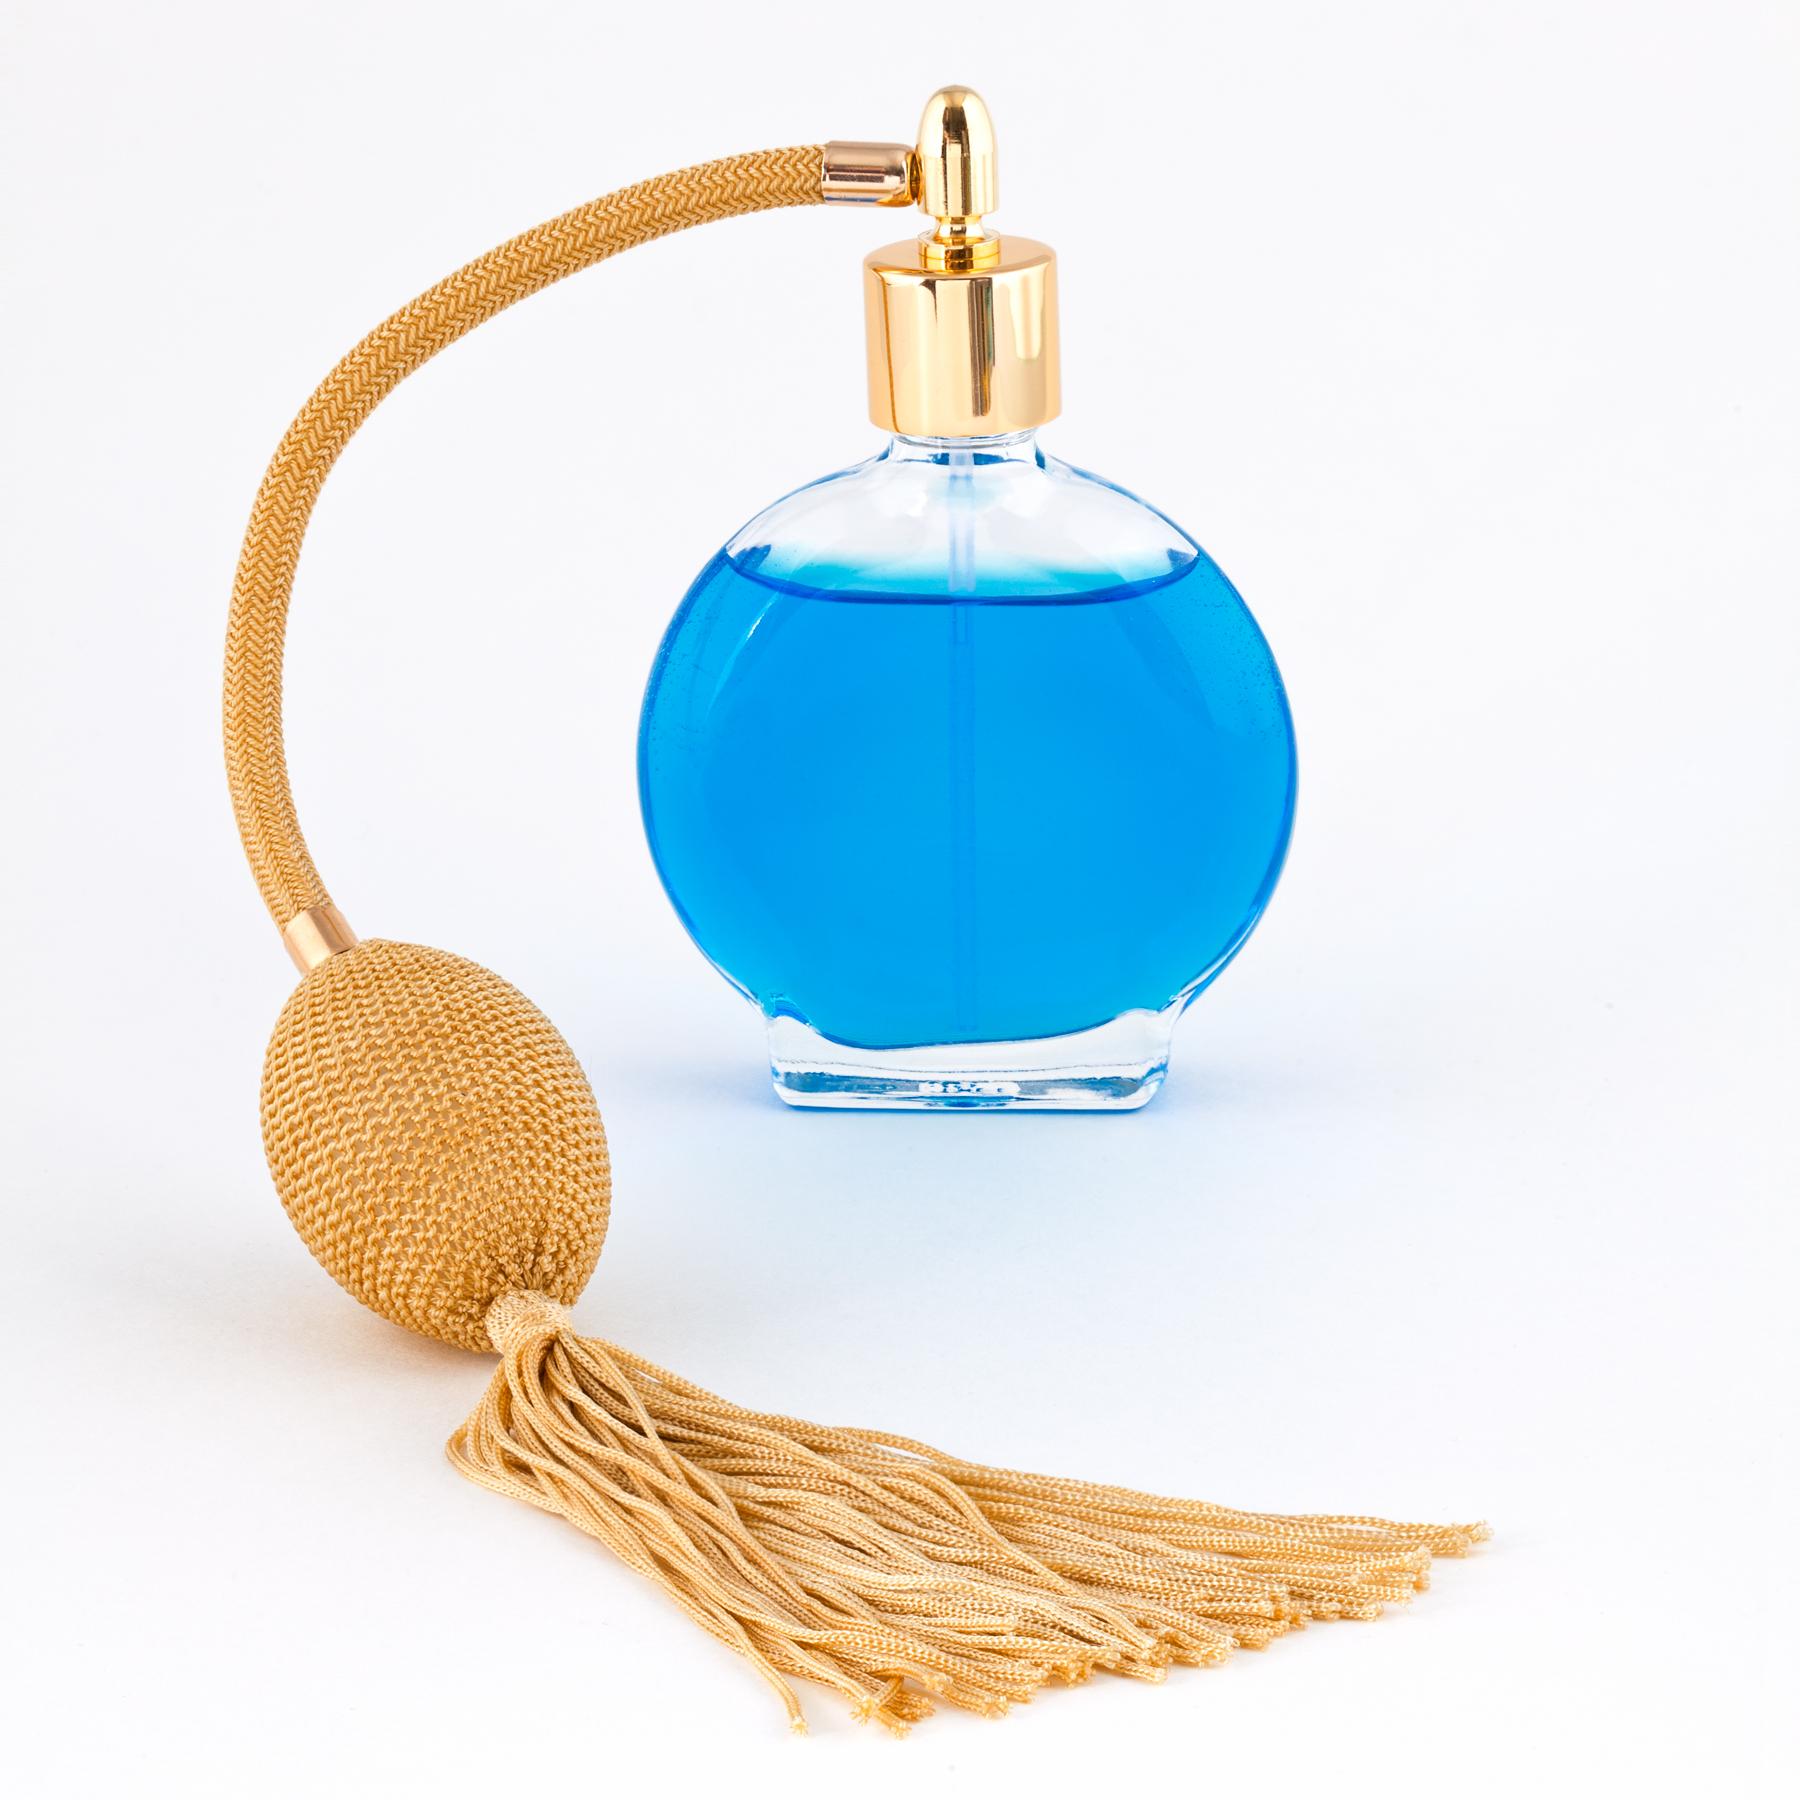 Vintage Perfume Bottle, Antique, Perfume, Luxurious, Luxury, HQ Photo